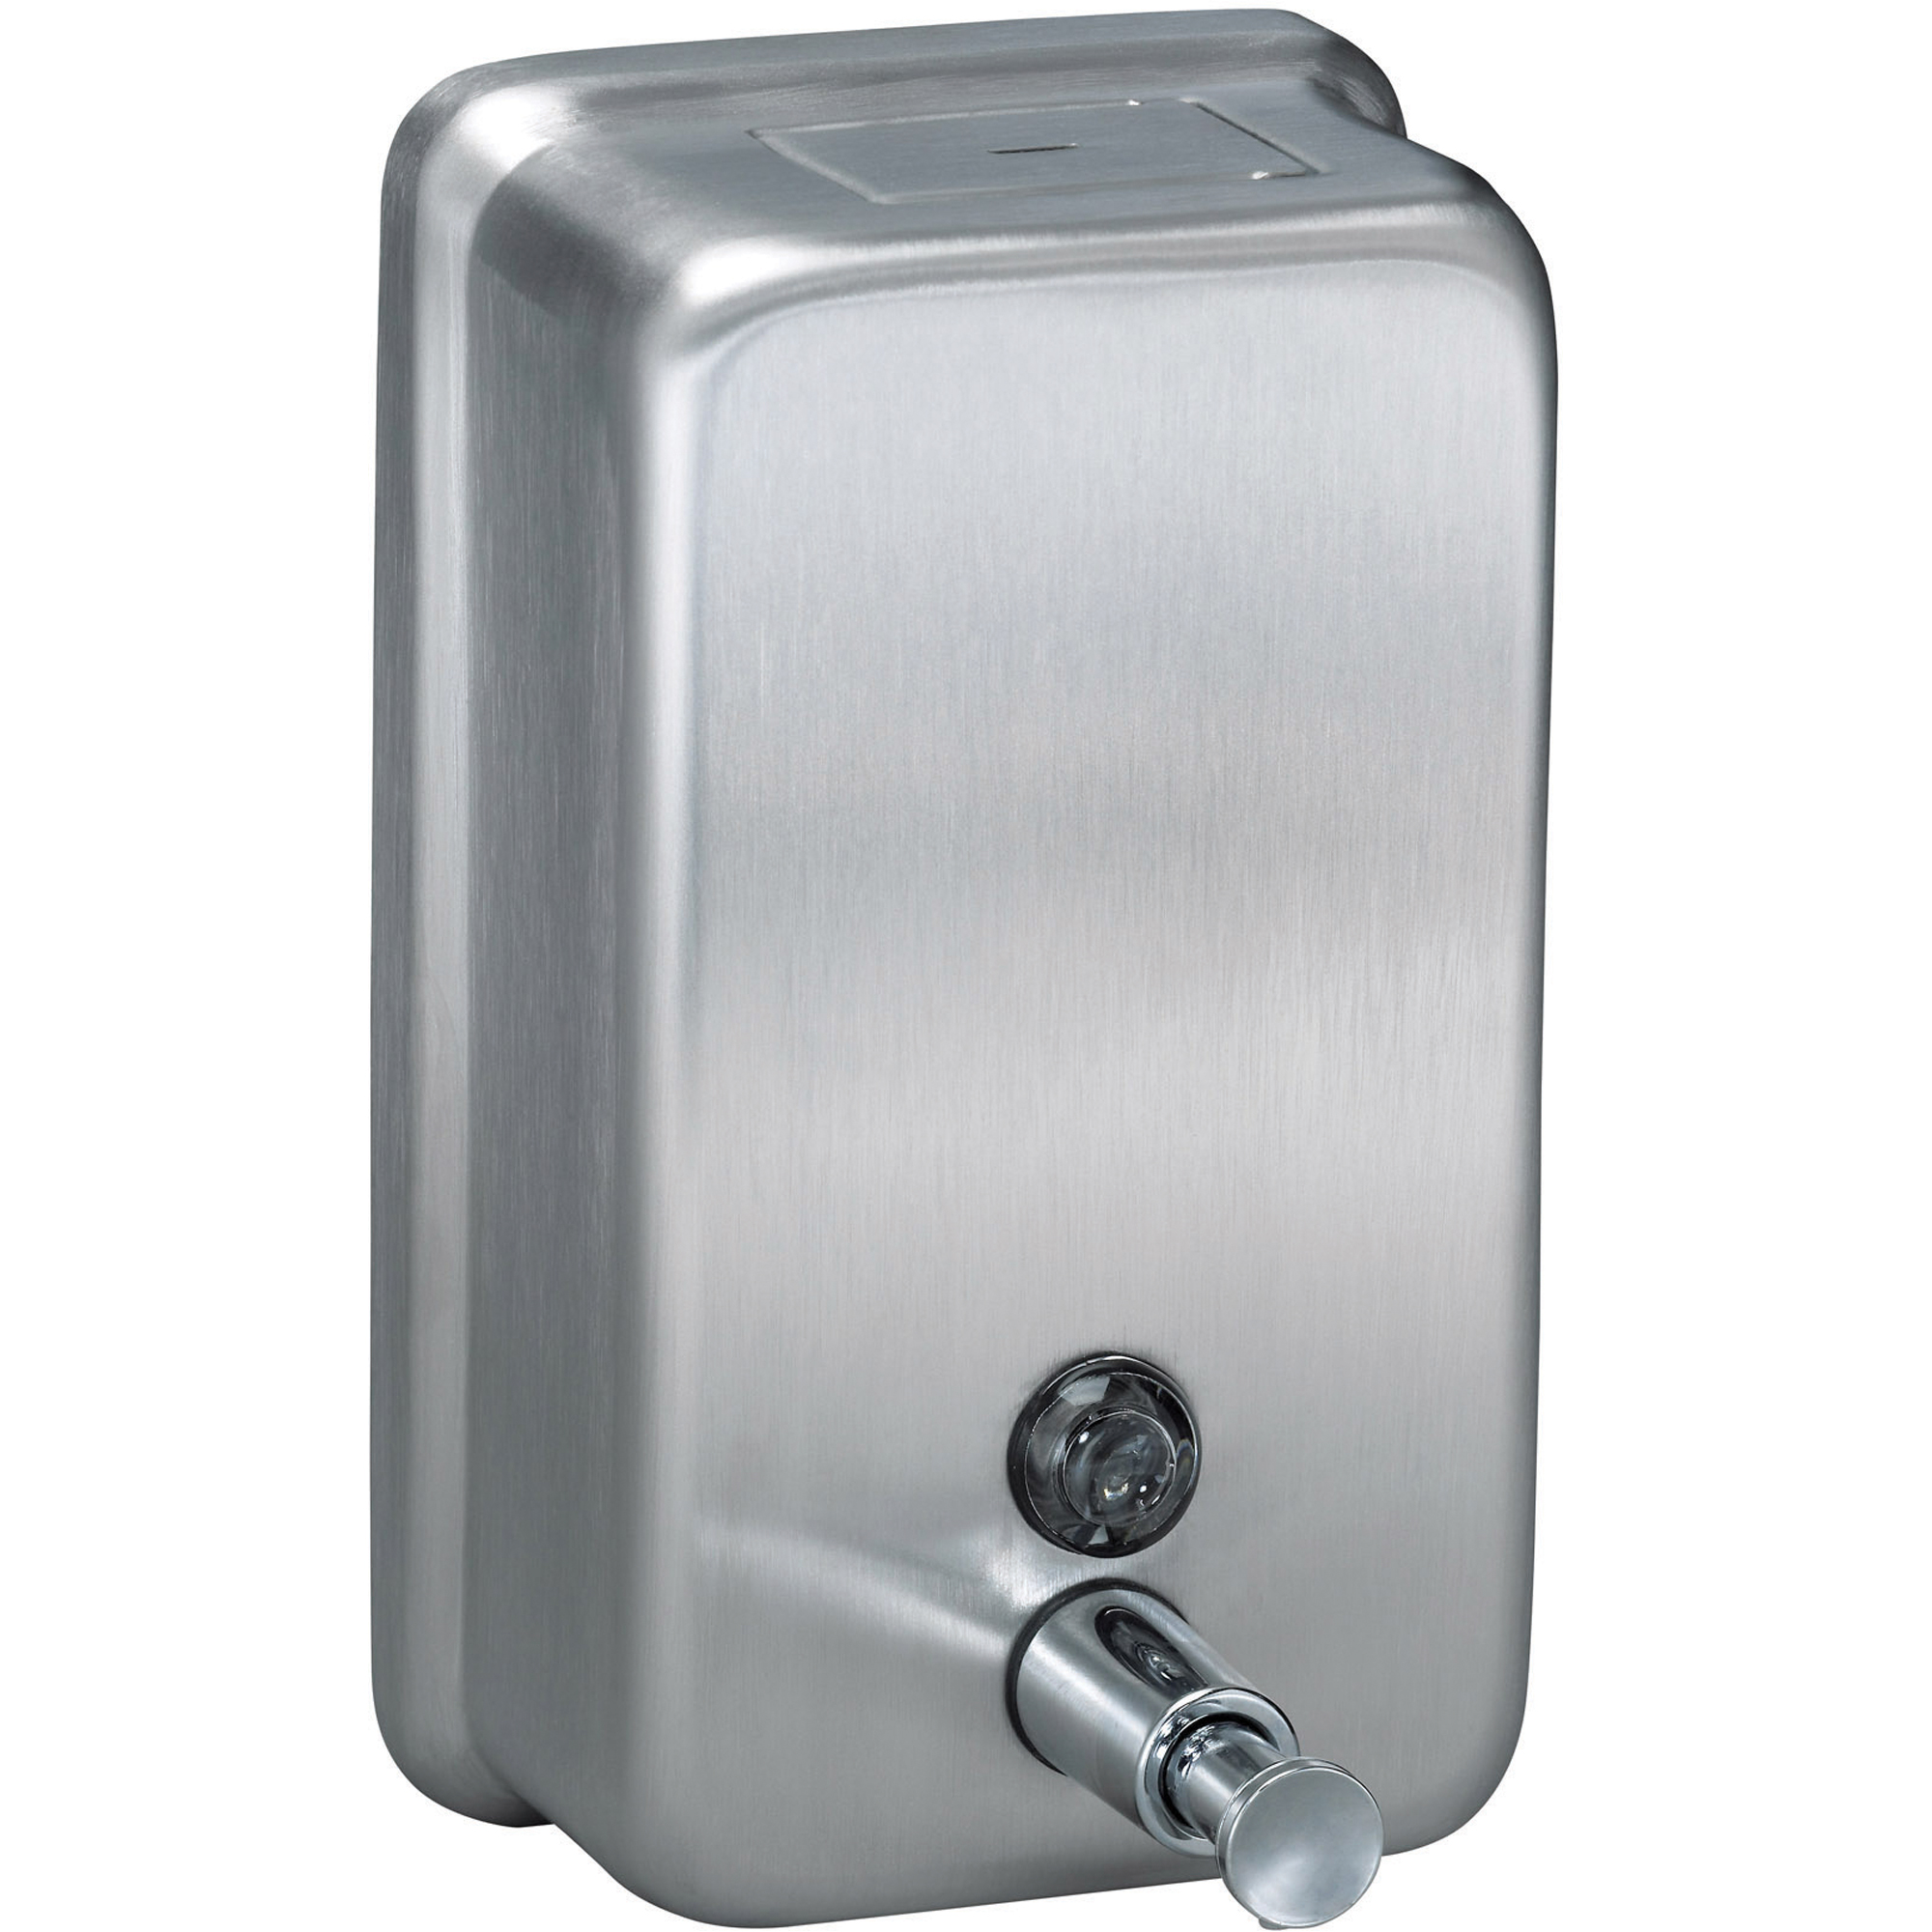 0f3ffc5d9ce4 Soap Dispensers - Tank Type Soap Dispensers